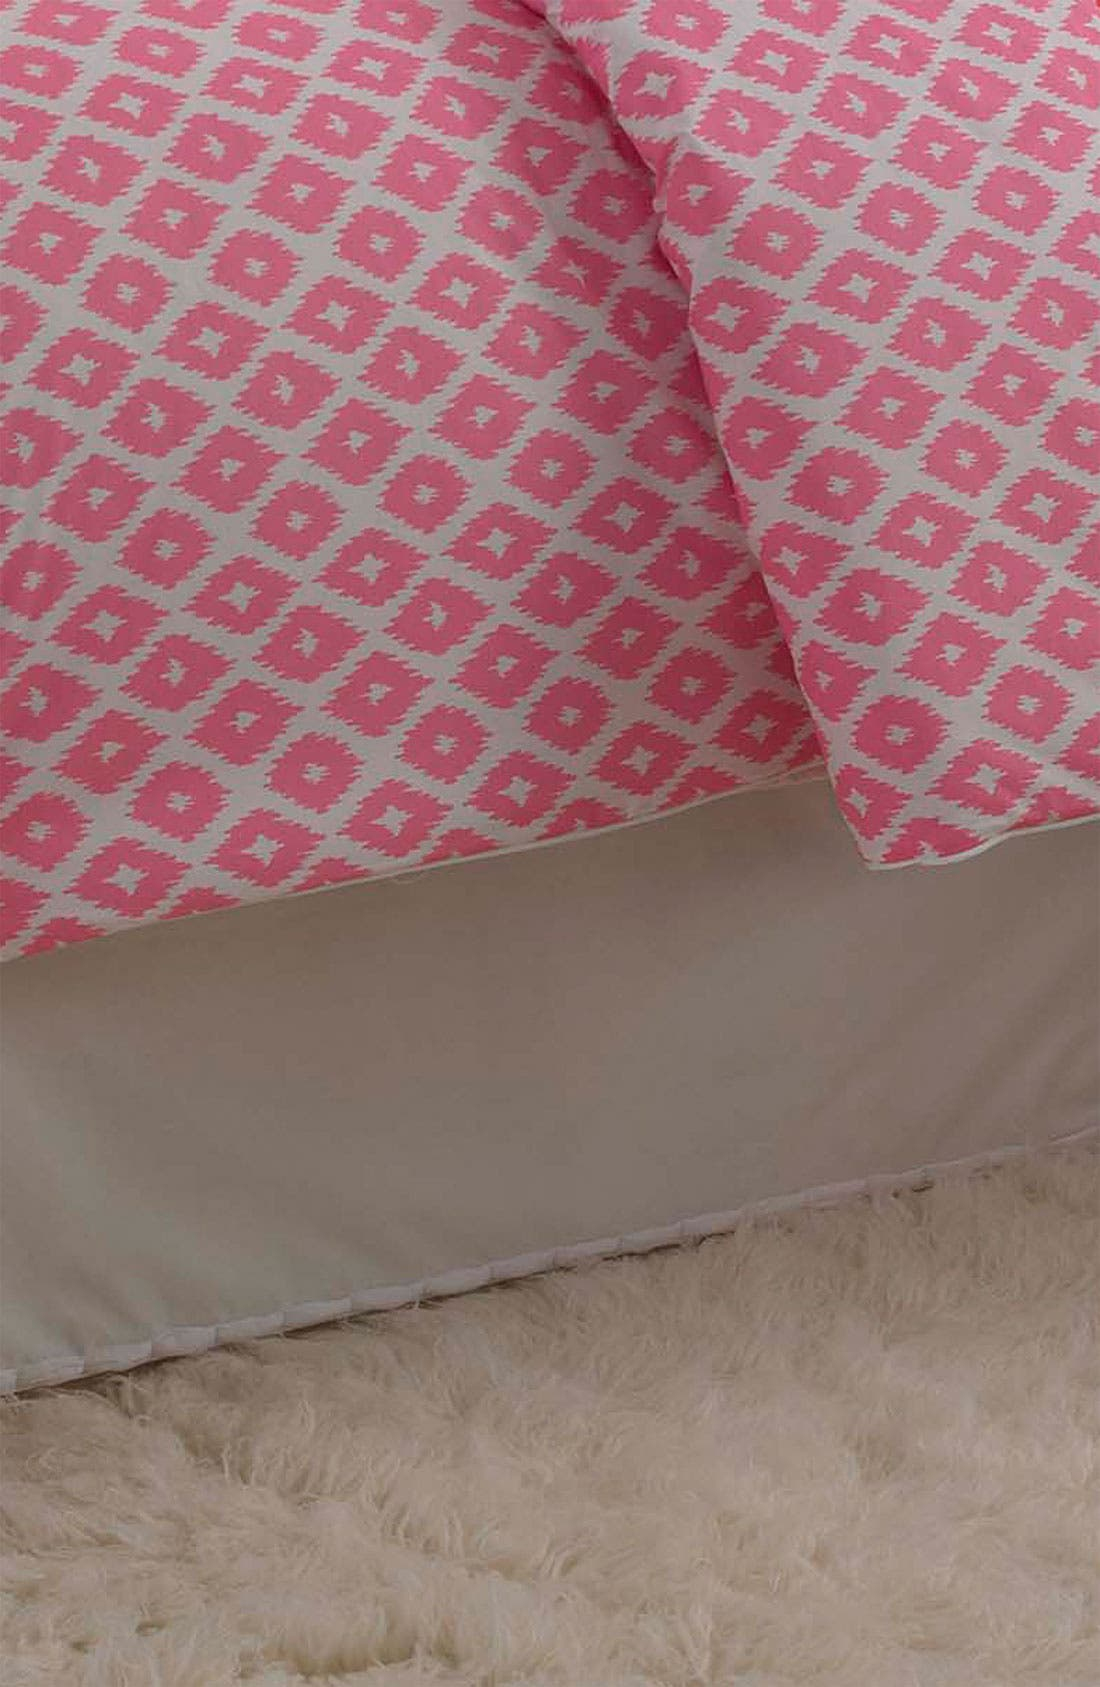 Main Image - Dena Home 'Ikat Blossom' Bed Skirt